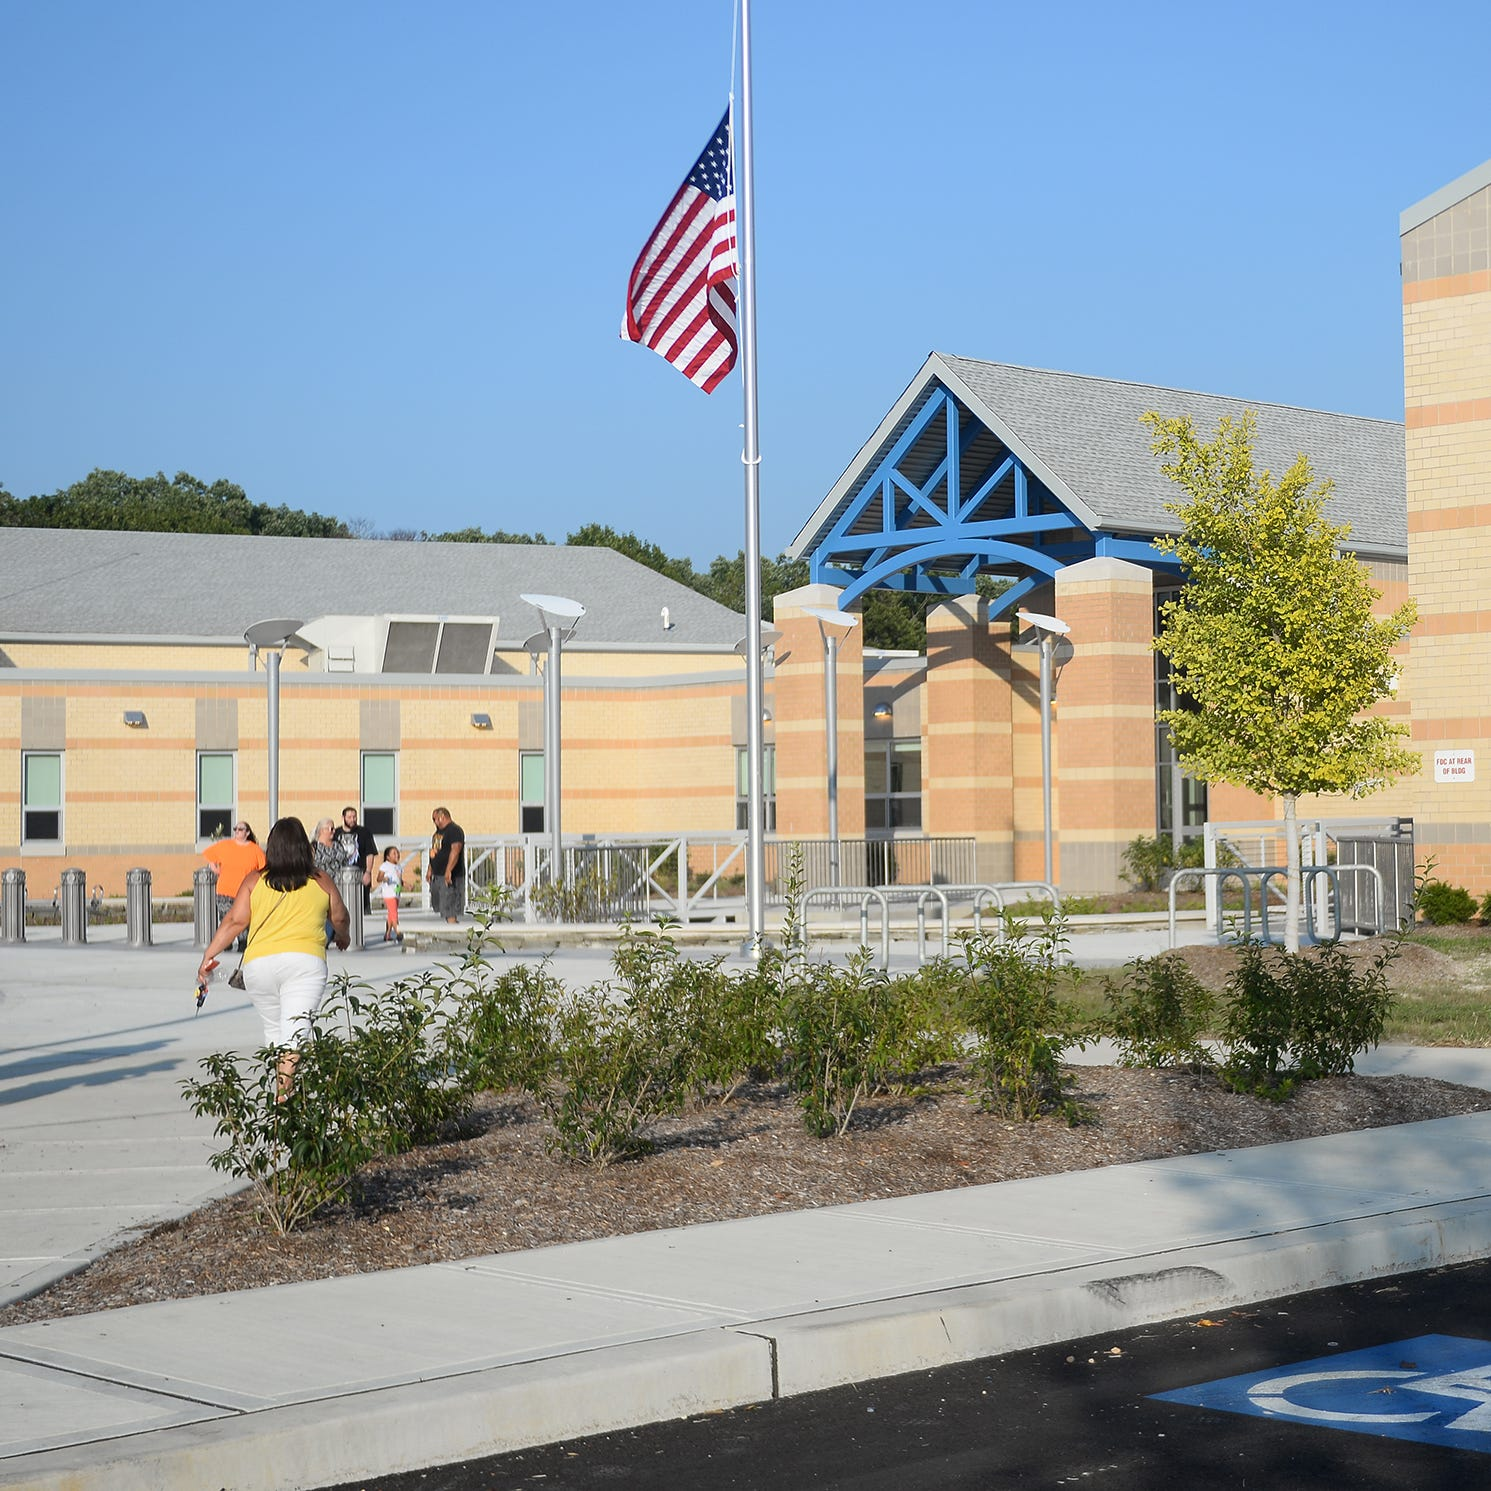 Community submits a dozen names for renaming Vineland school